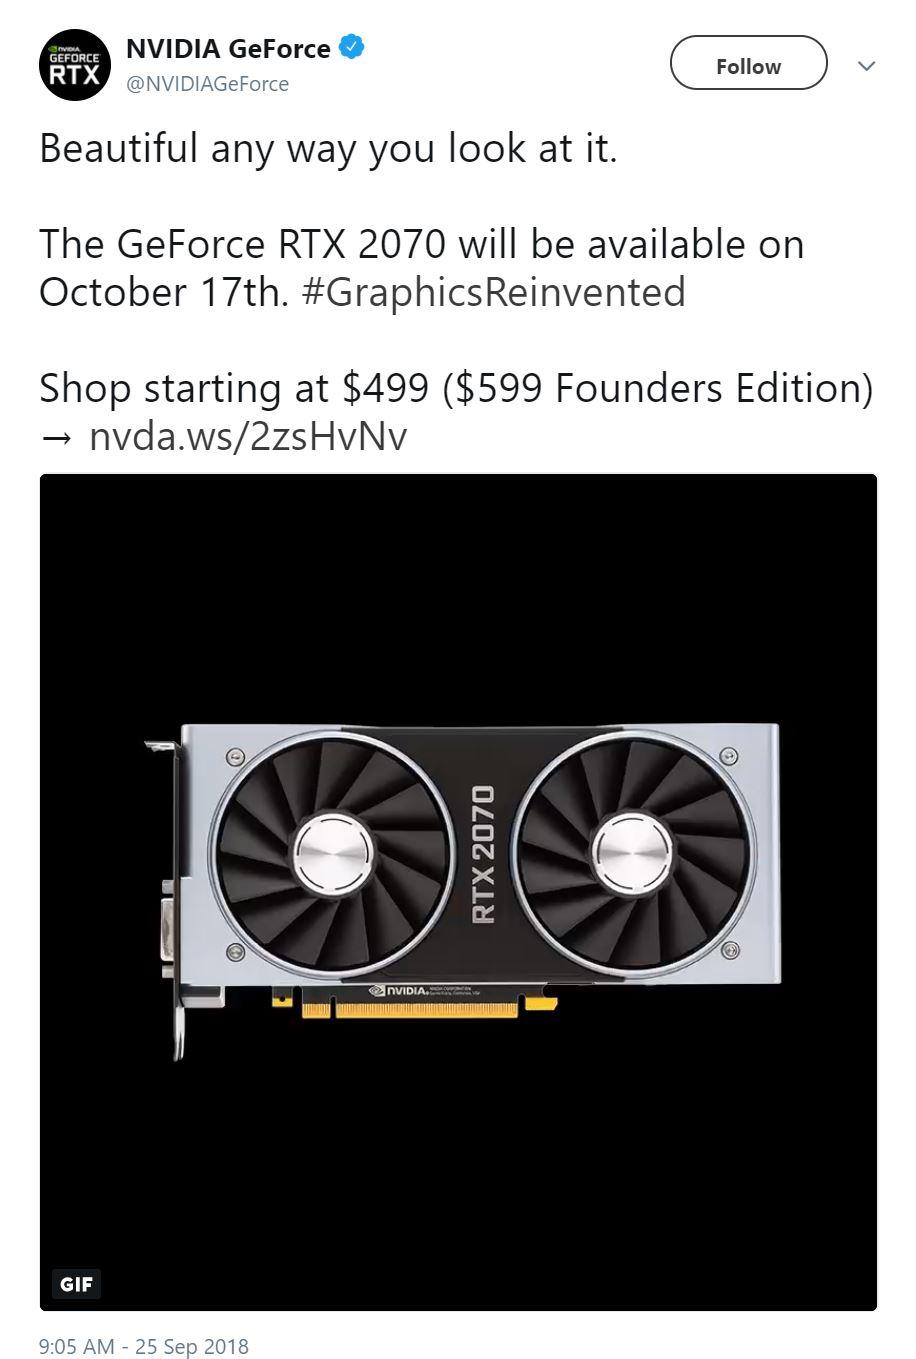 nvidia geforce rtx 2070 launch date Nvidia เตรียมเปิดตัว GeForce RTX 2070 ในวันที่ 17ตุลาคมที่จะถึงนี้ราคาอยู่ที่ 499 599ดอลล่าสหรัฐฯ